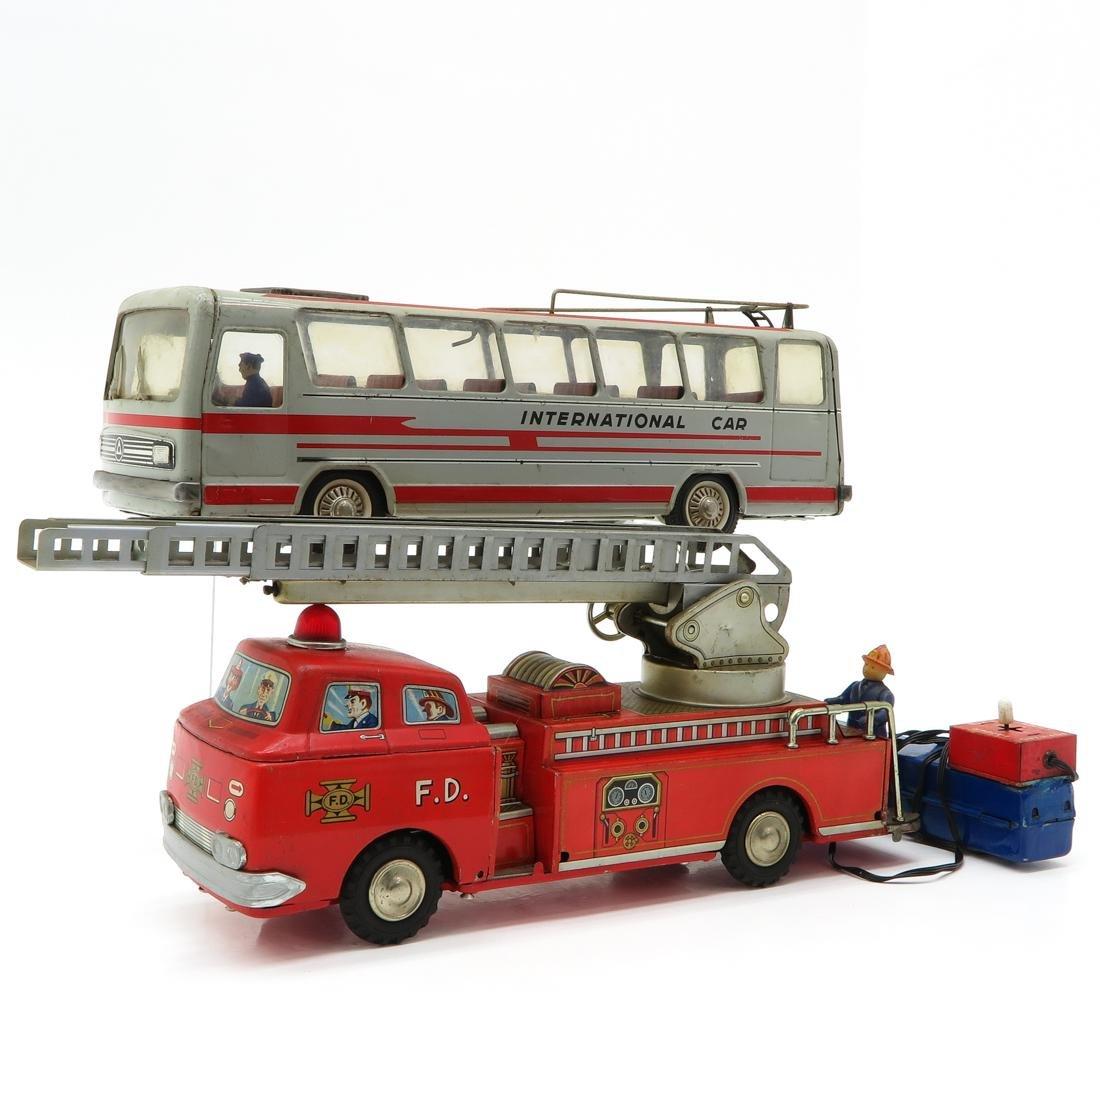 Lot of 2 Vintage Toys - 2